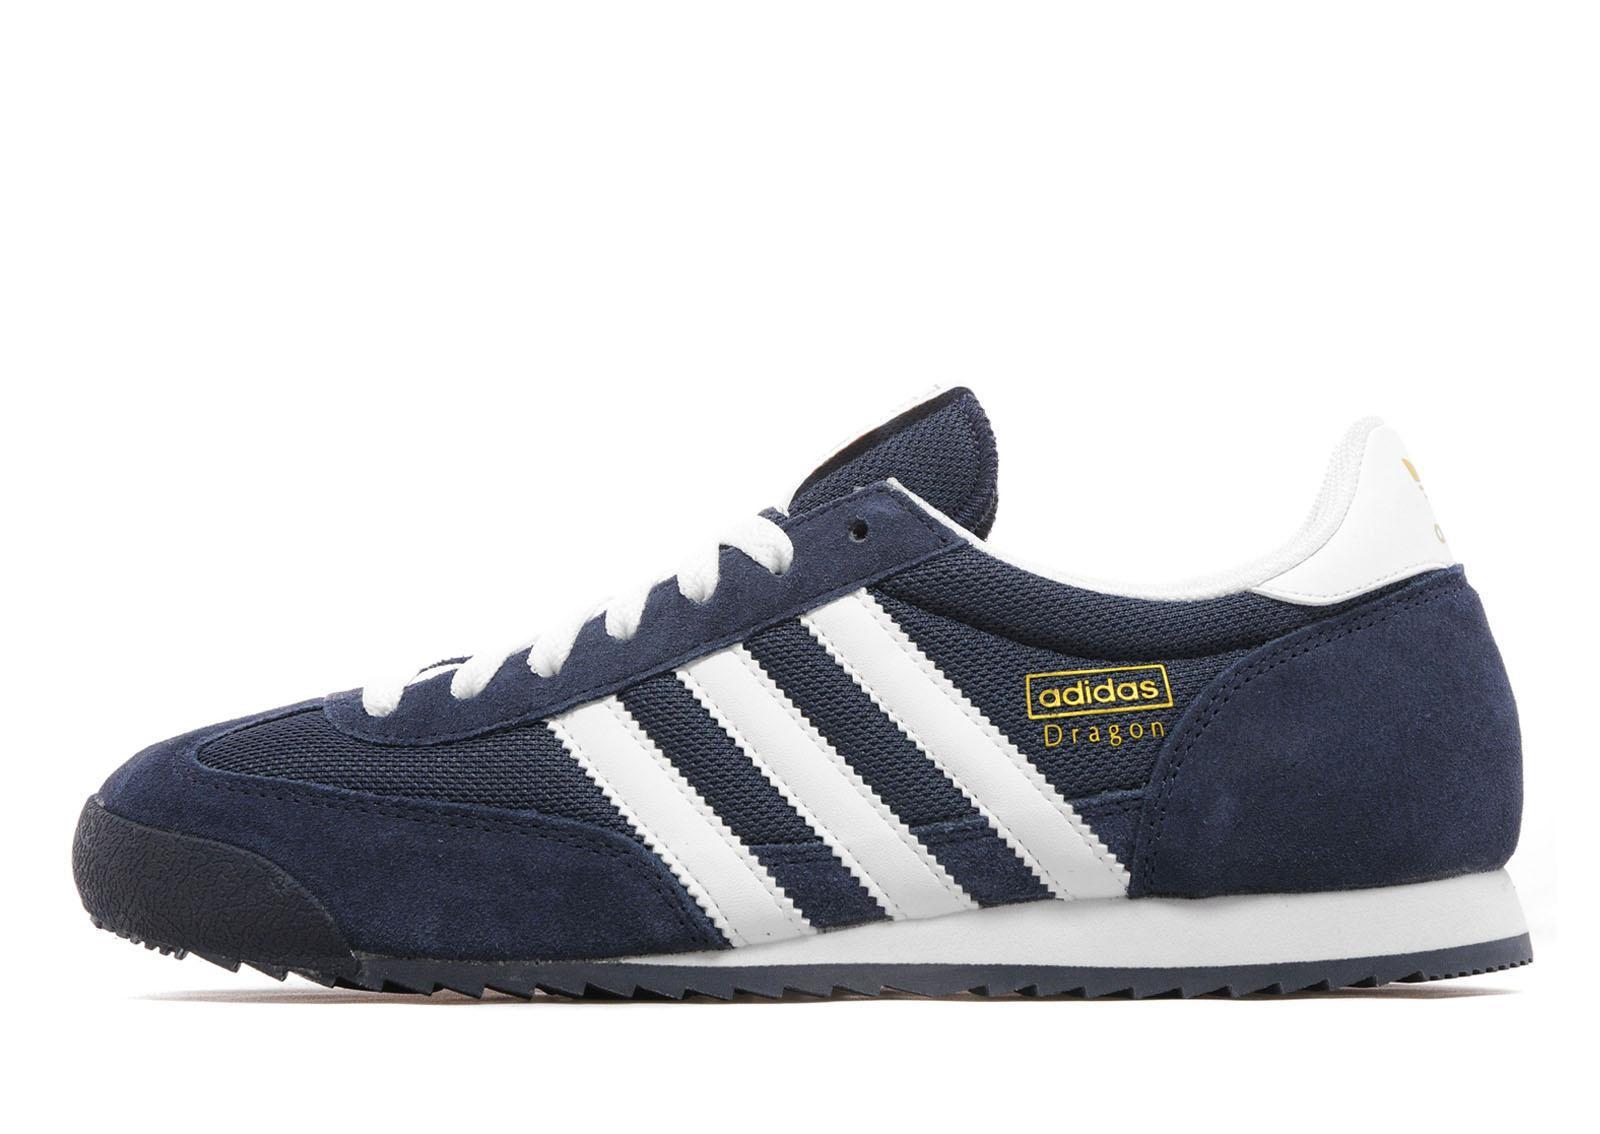 Adidas Originals Dragon In Blue For Men